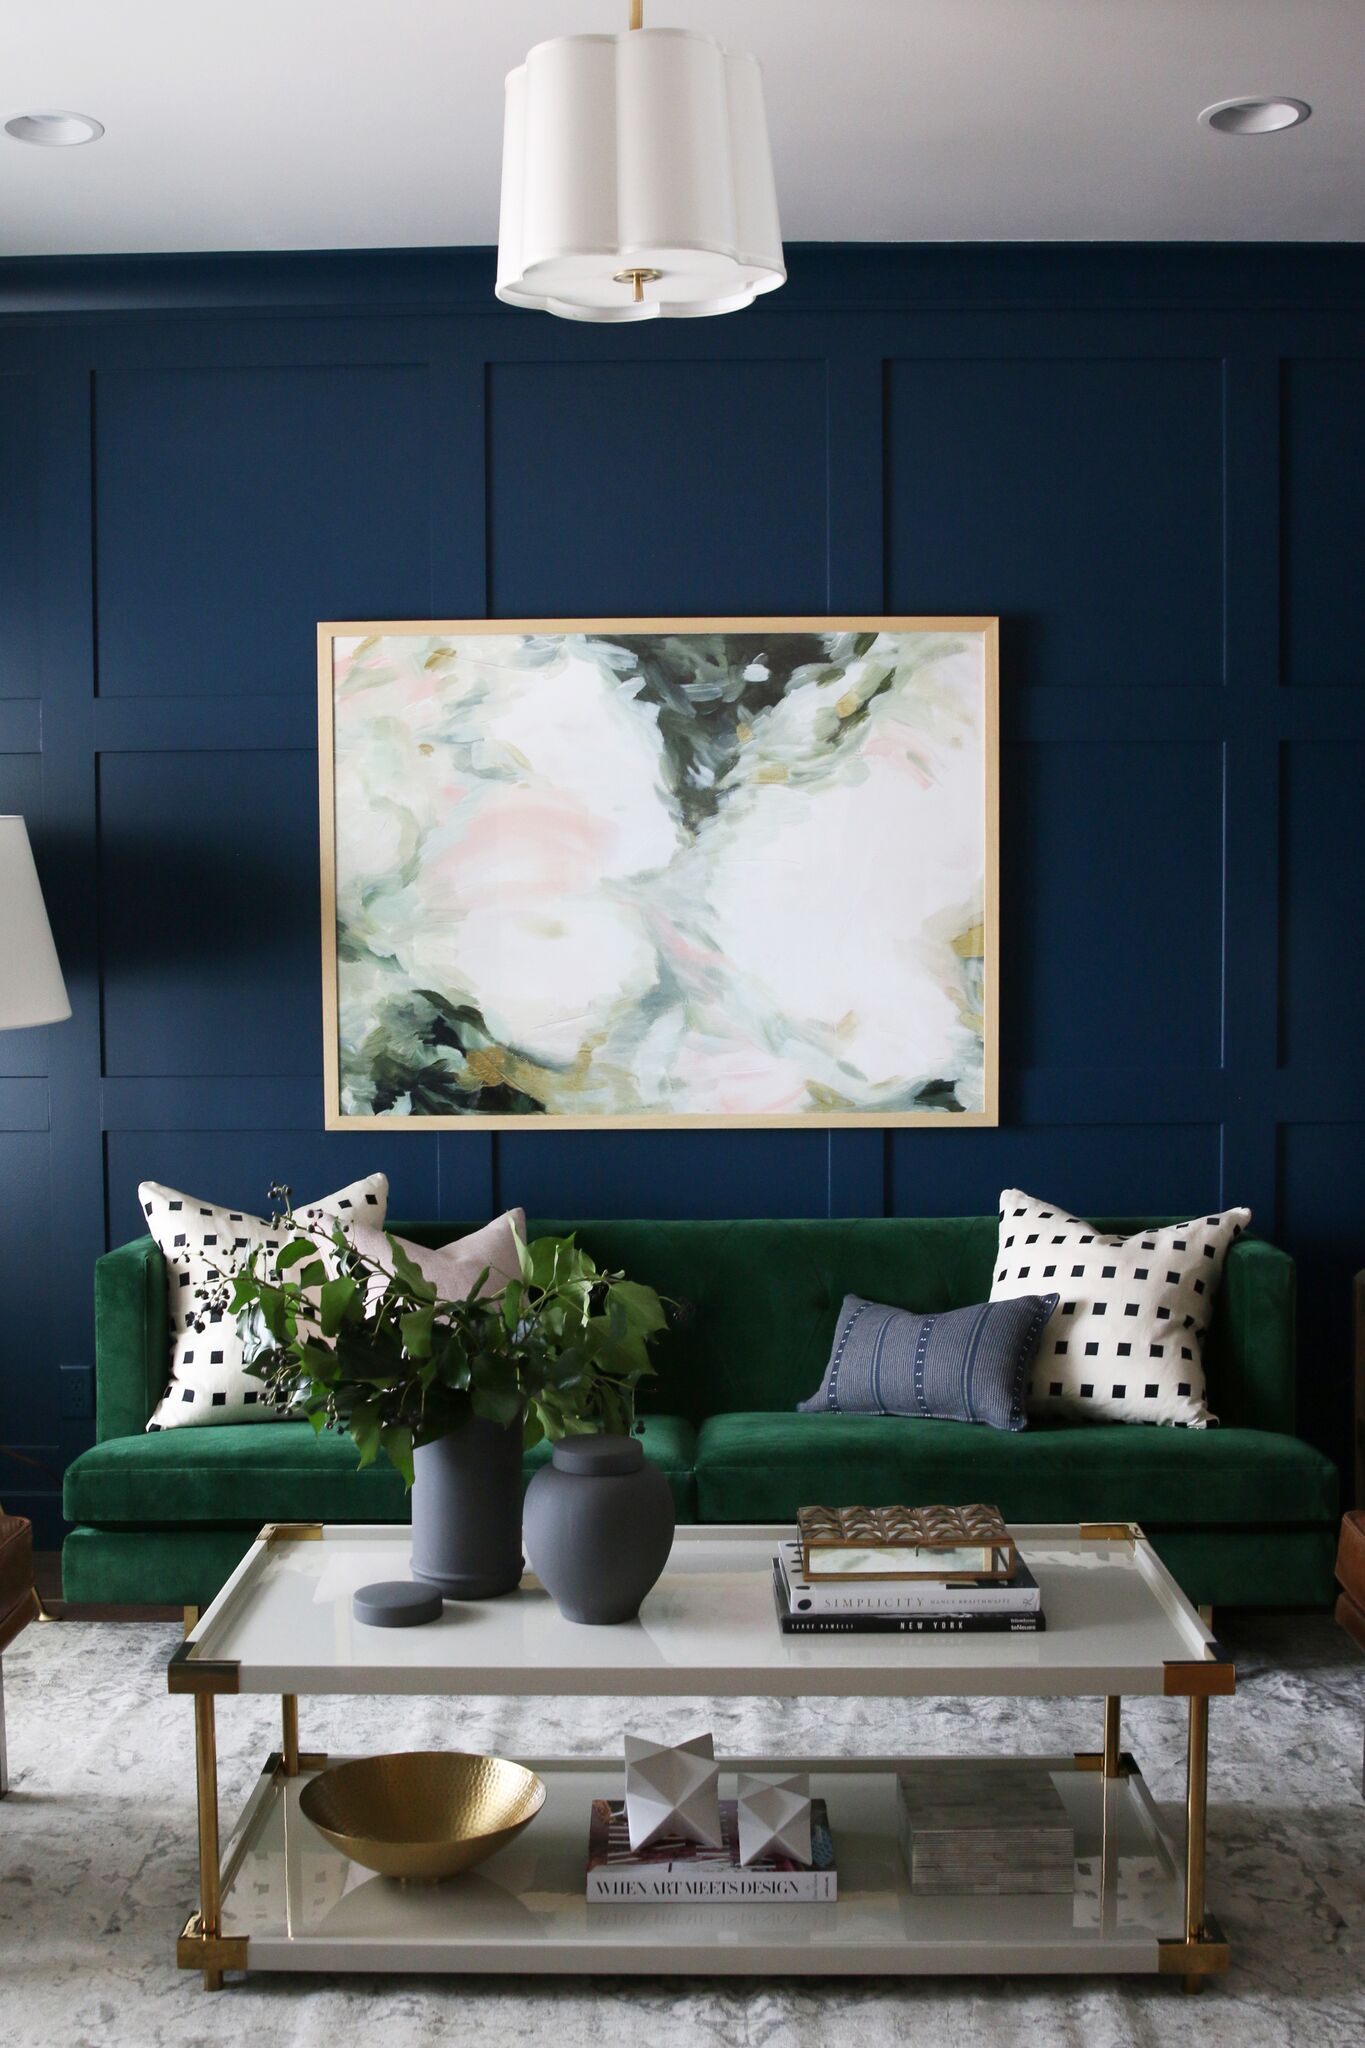 Green couch underneath white artwork